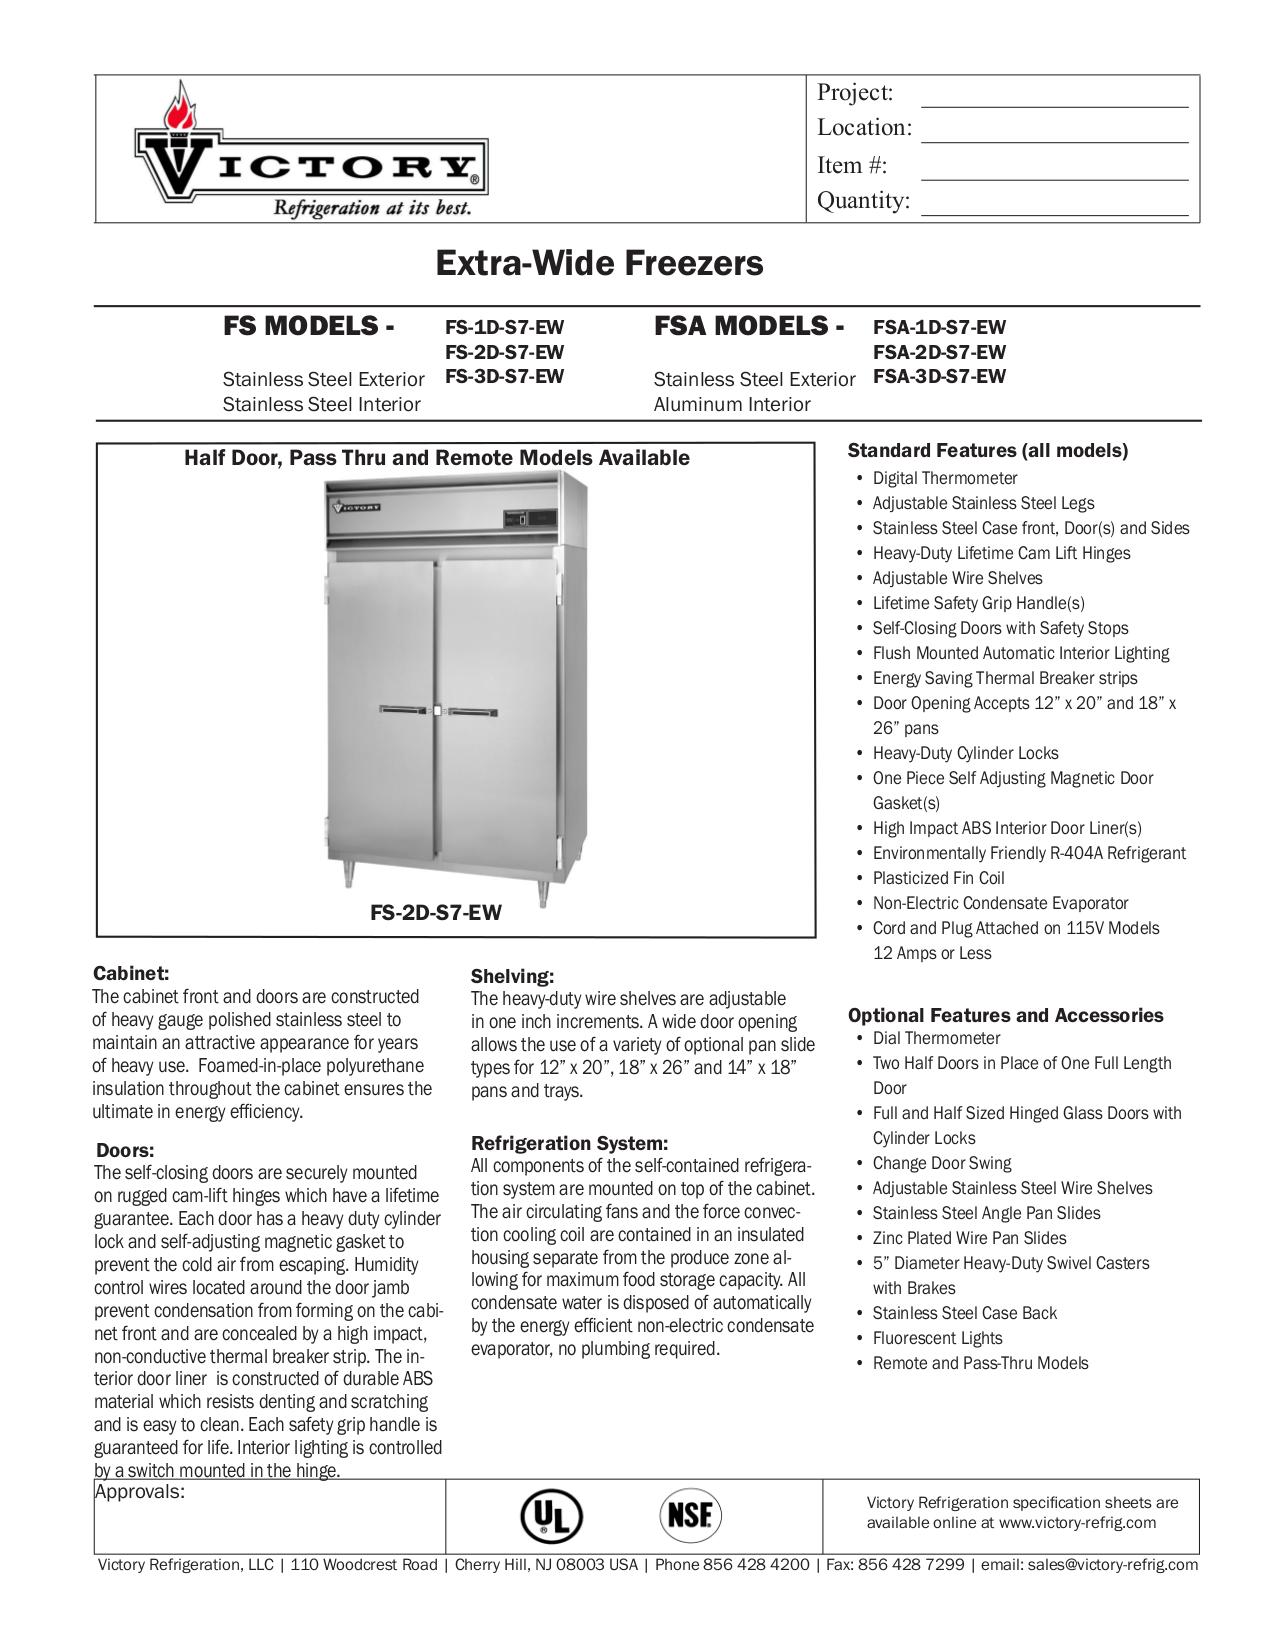 pdf for Victory Freezer FSA-3D-S7-EW manual